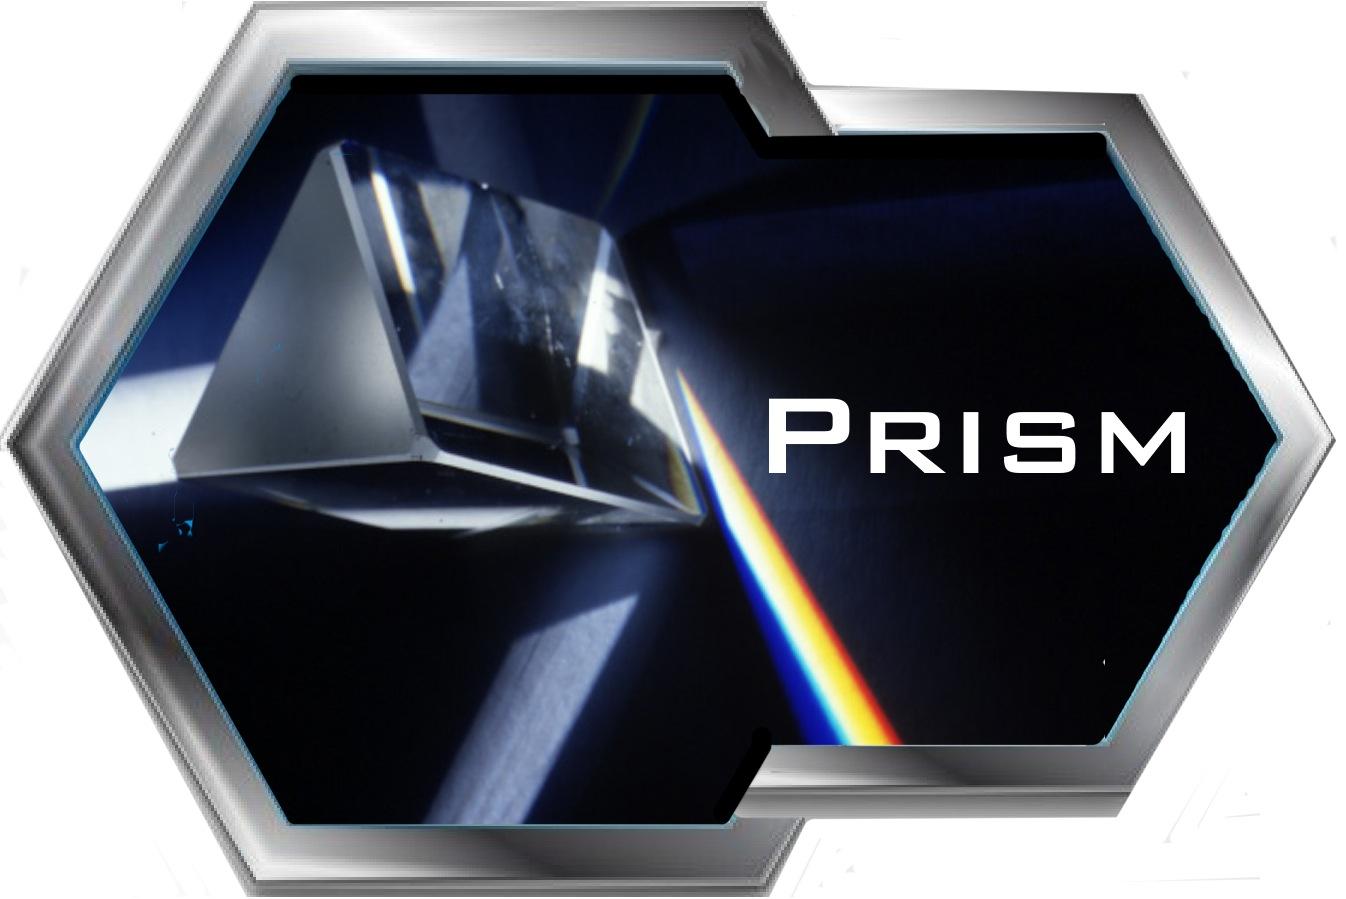 PRISM: el programa de espionaje de la NSA.